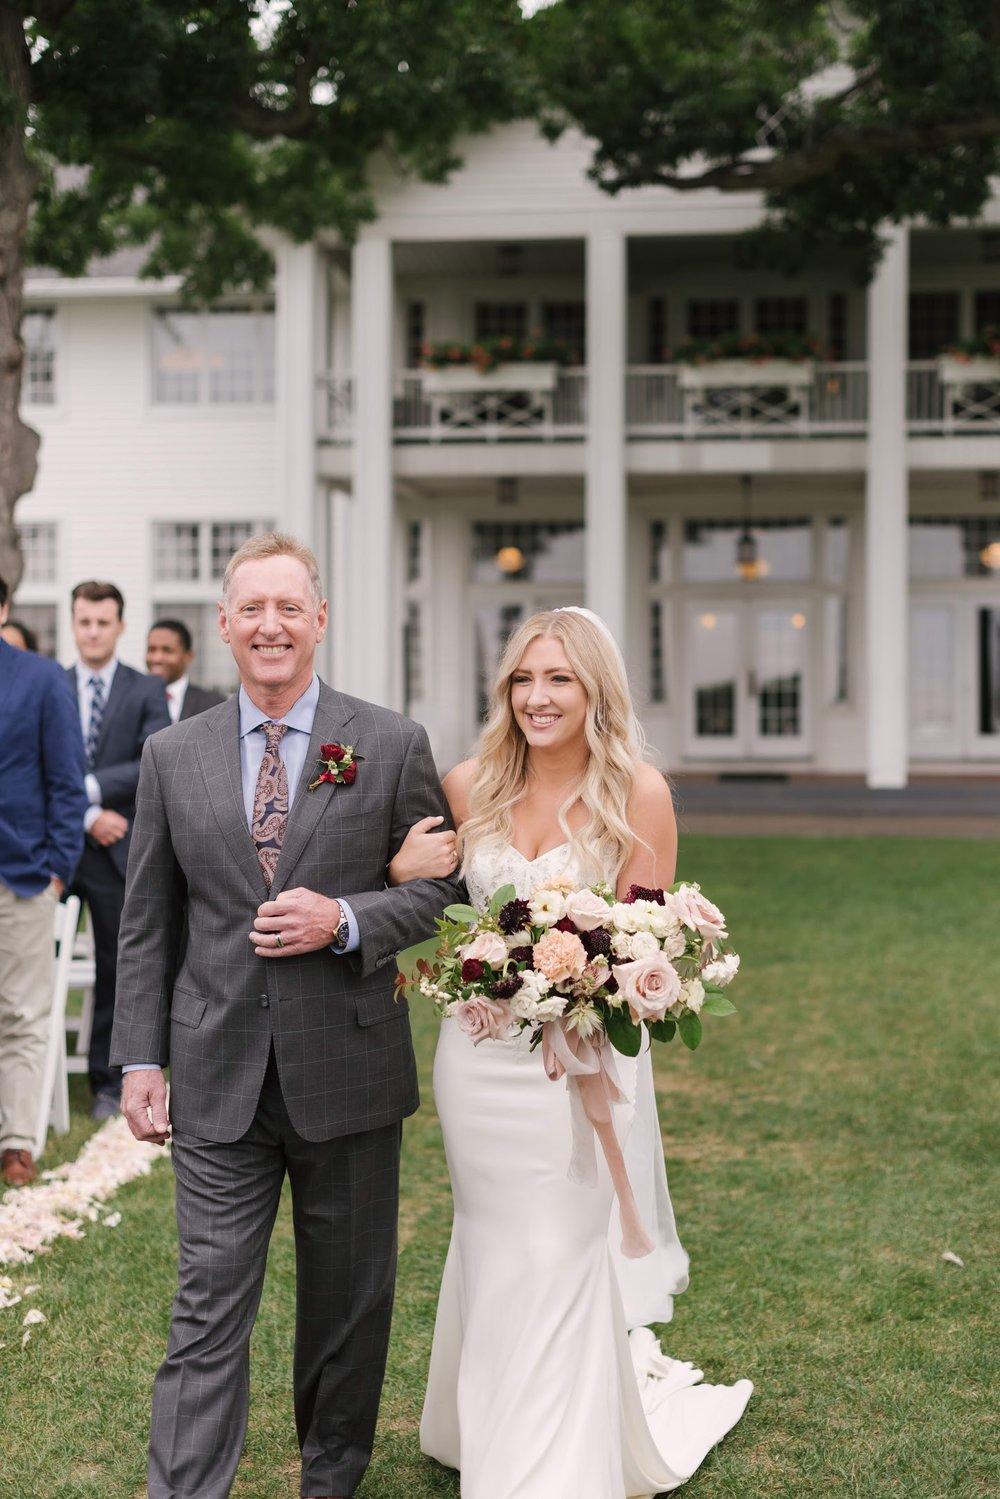 Field-Gems-Photography-Detroit-Michigan-Wedding-Photographer-Family-Photographer-Photobooth-090818-625.jpg